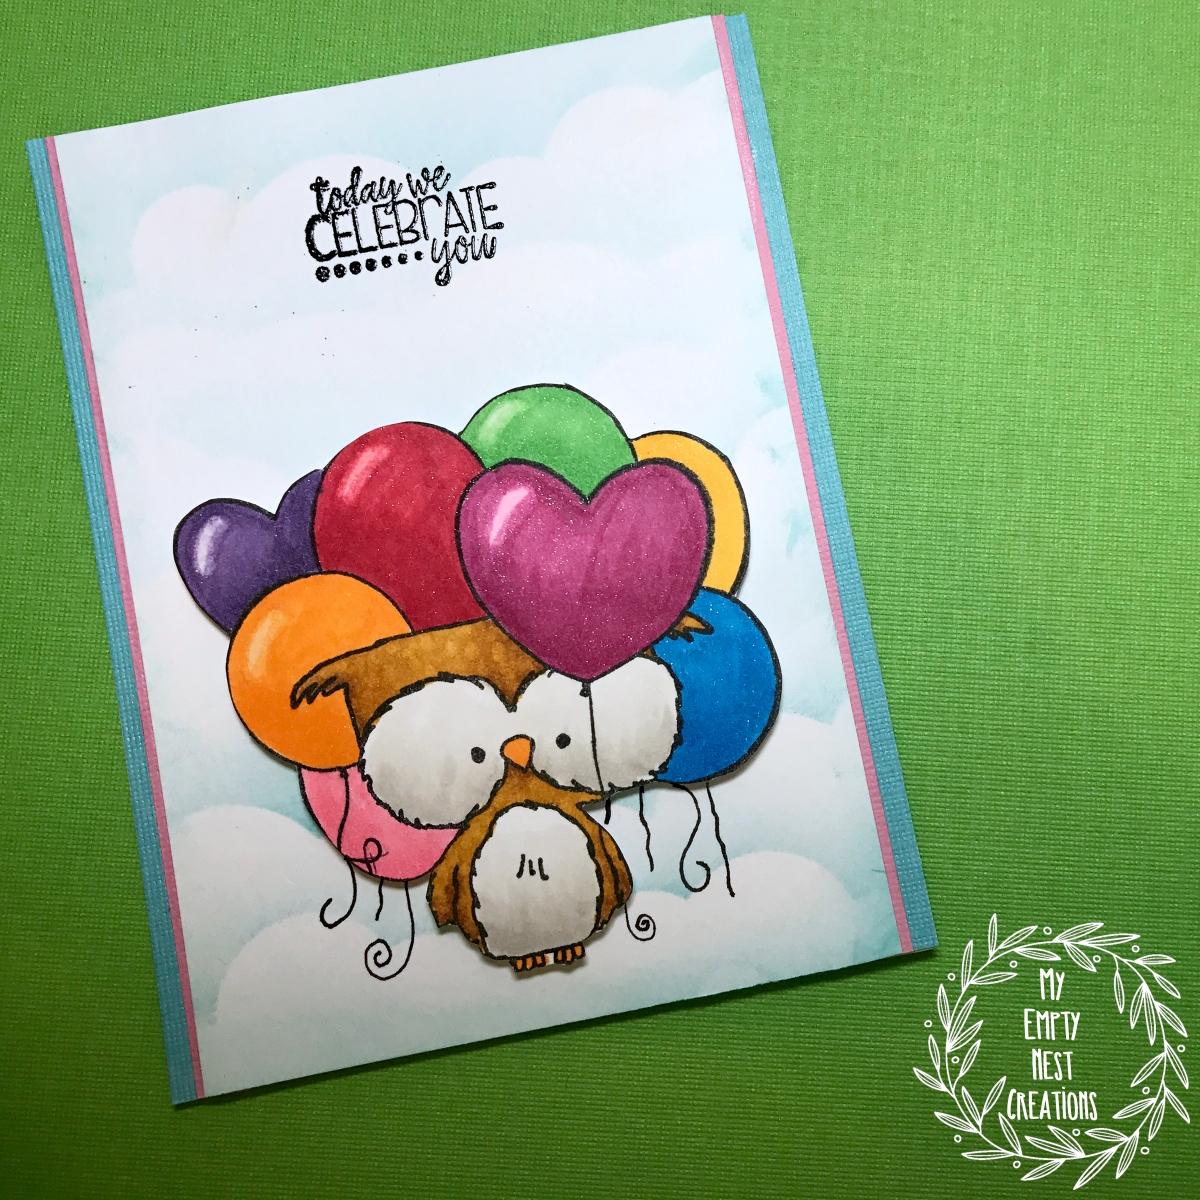 My Empty Nest Creations Unity Hugs, Kisses & Birthday Wishes Stamp Set